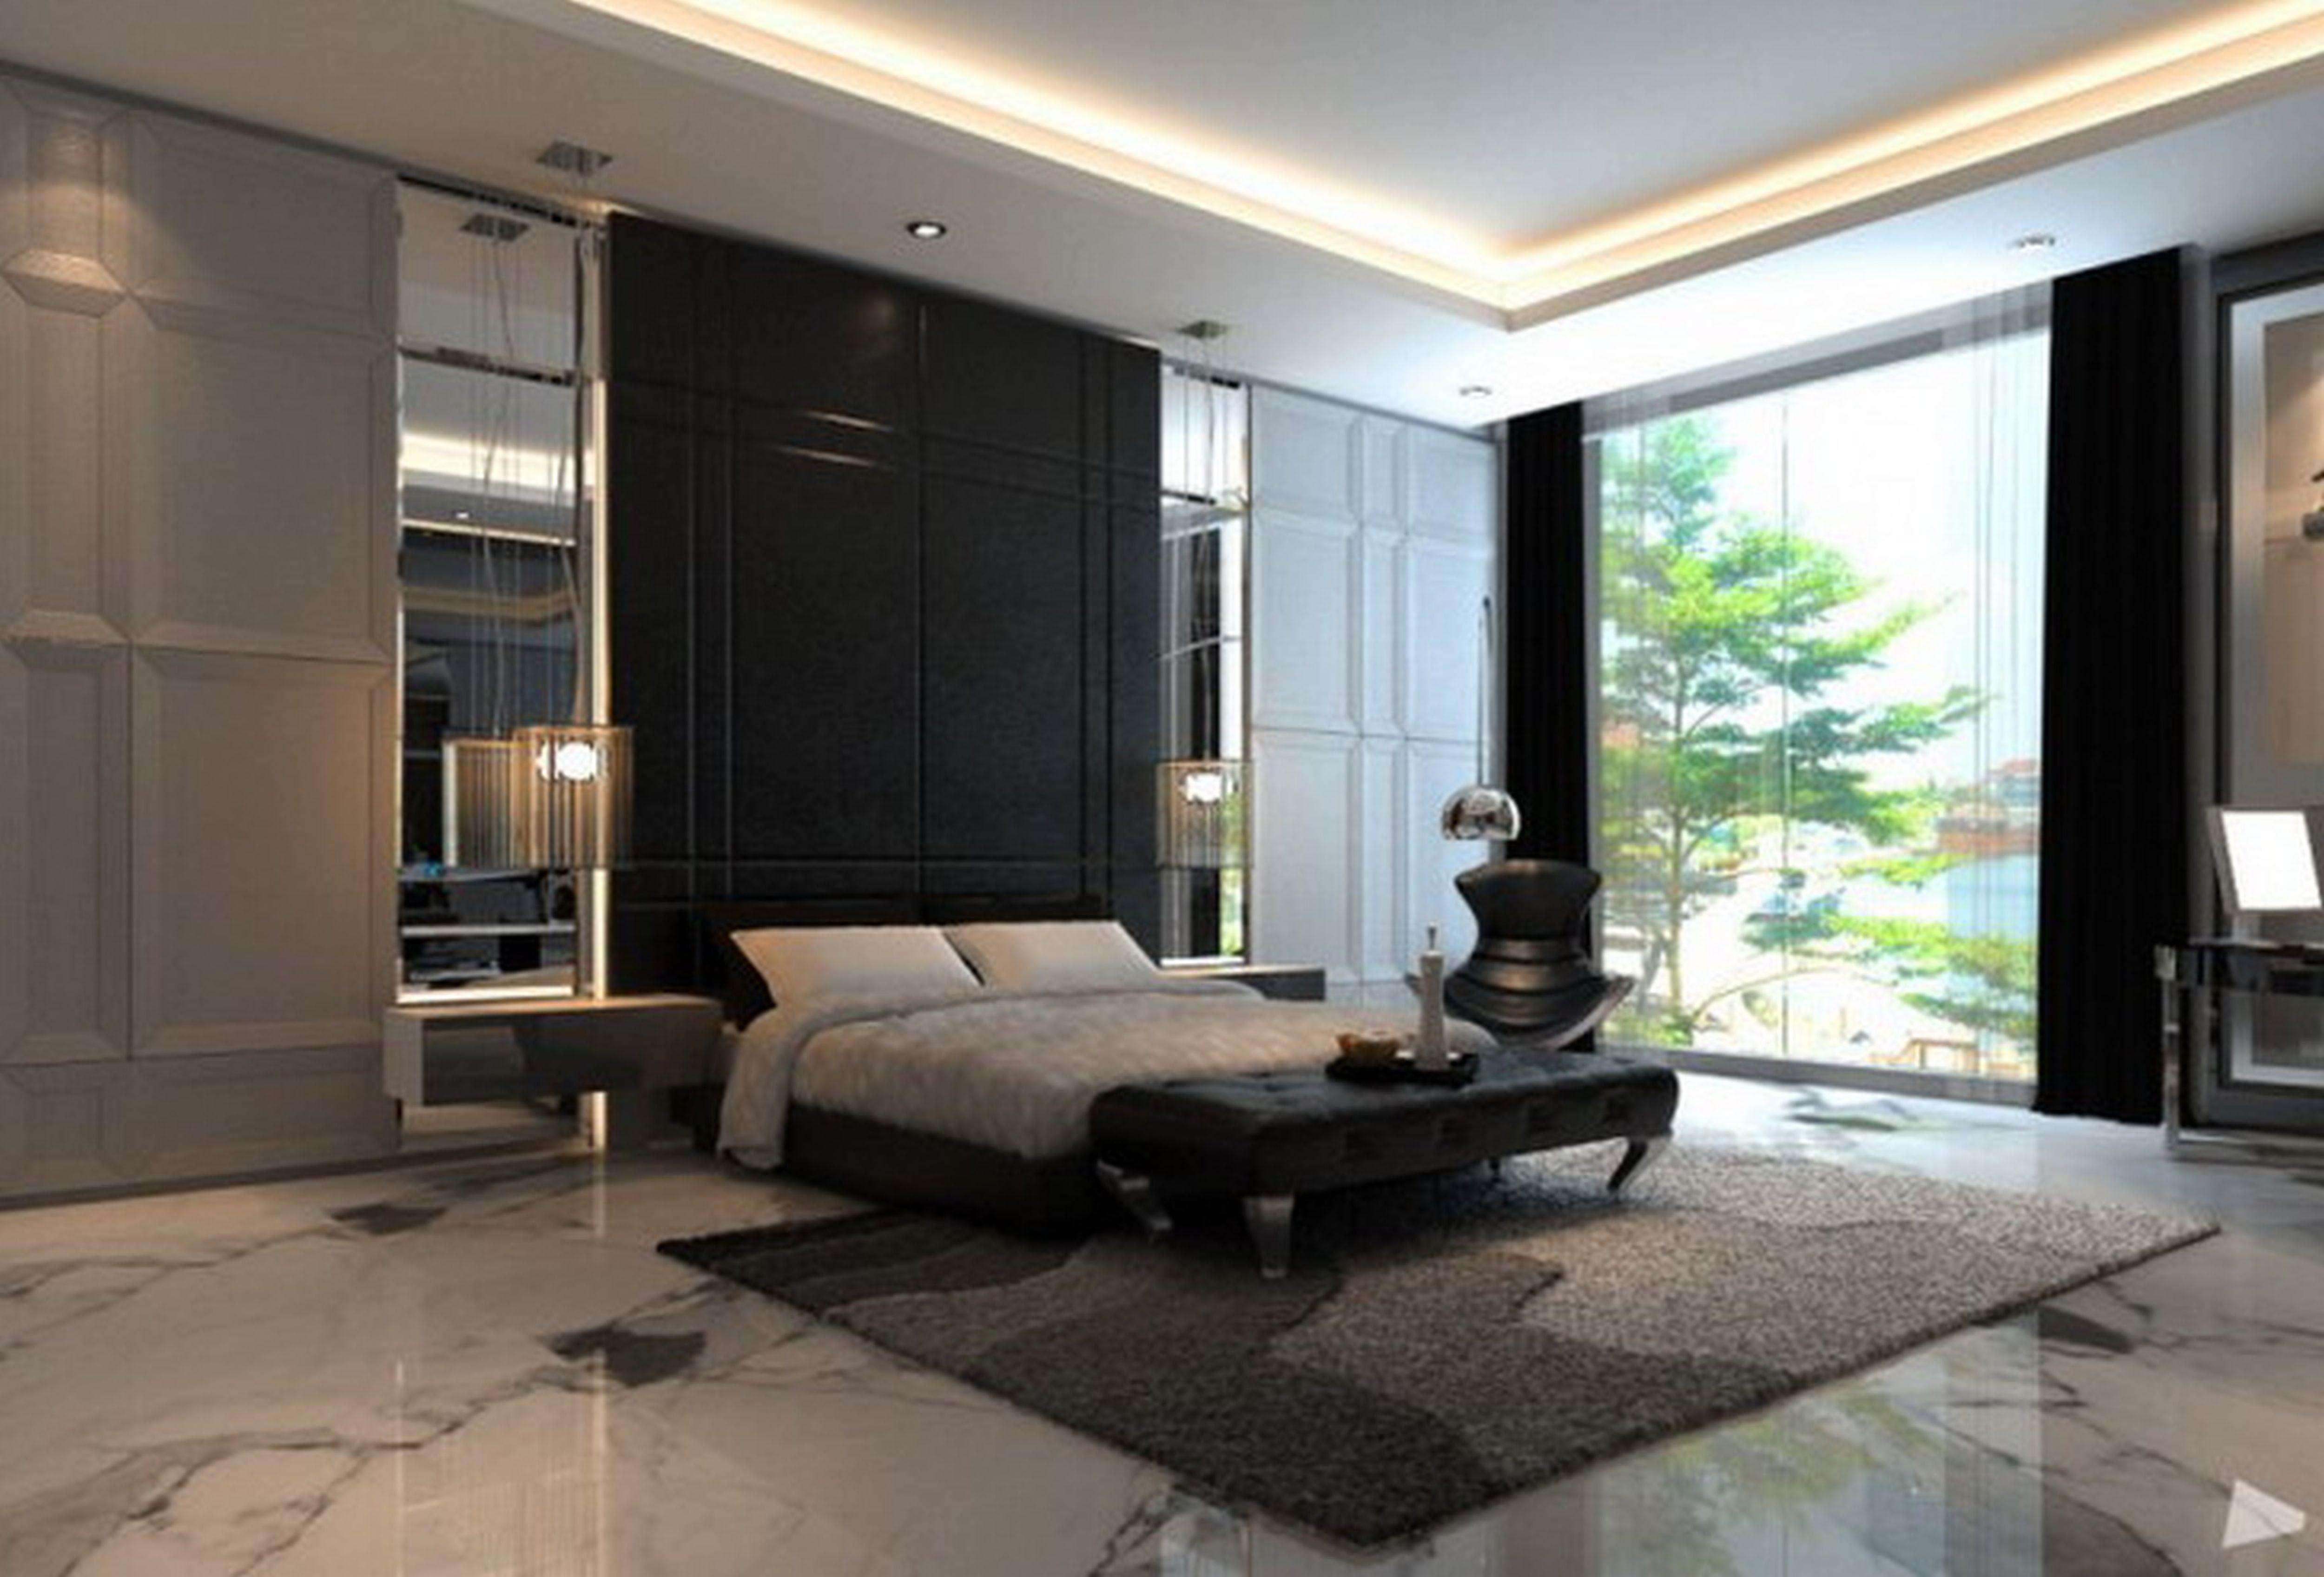 Interior Design Bedroom Classy Love The Grandeur  Master Decor  Pinterest  Bedrooms Inspiration Design